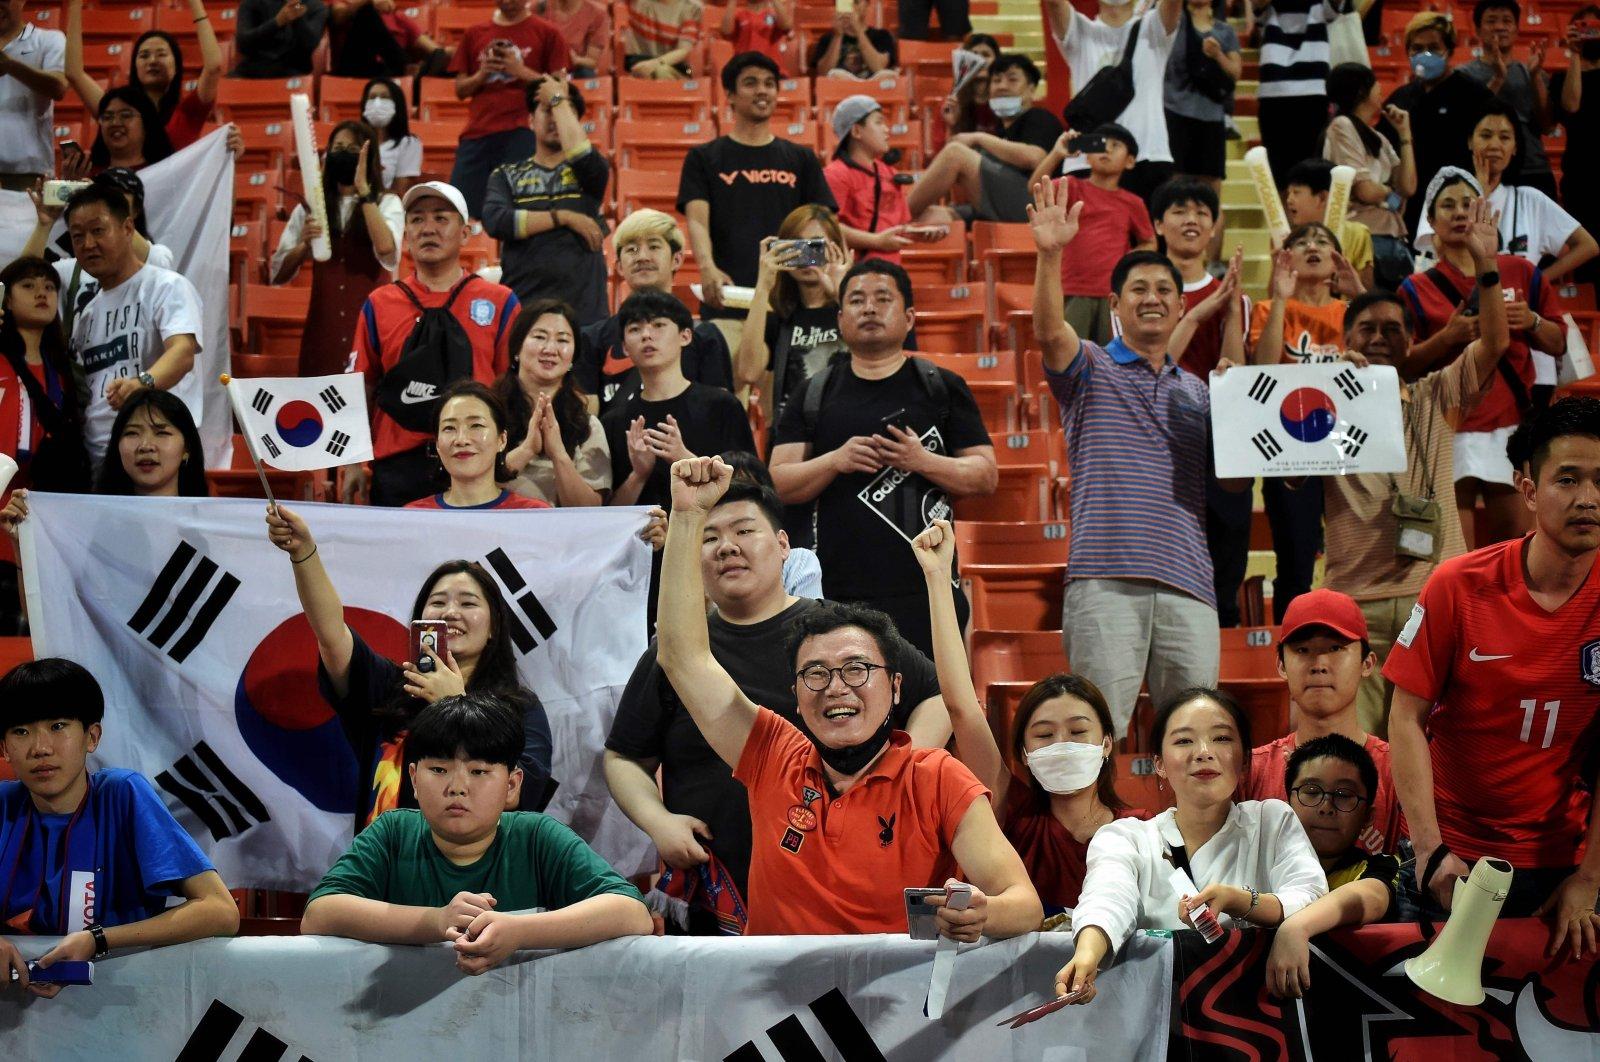 South Korean football fans celebrate winning the AFC U-23 Championship final football match between Saudi Arabia and South Korea, in Bangkok, Thailand, Jan. 26, 2020. (AFP Photo)